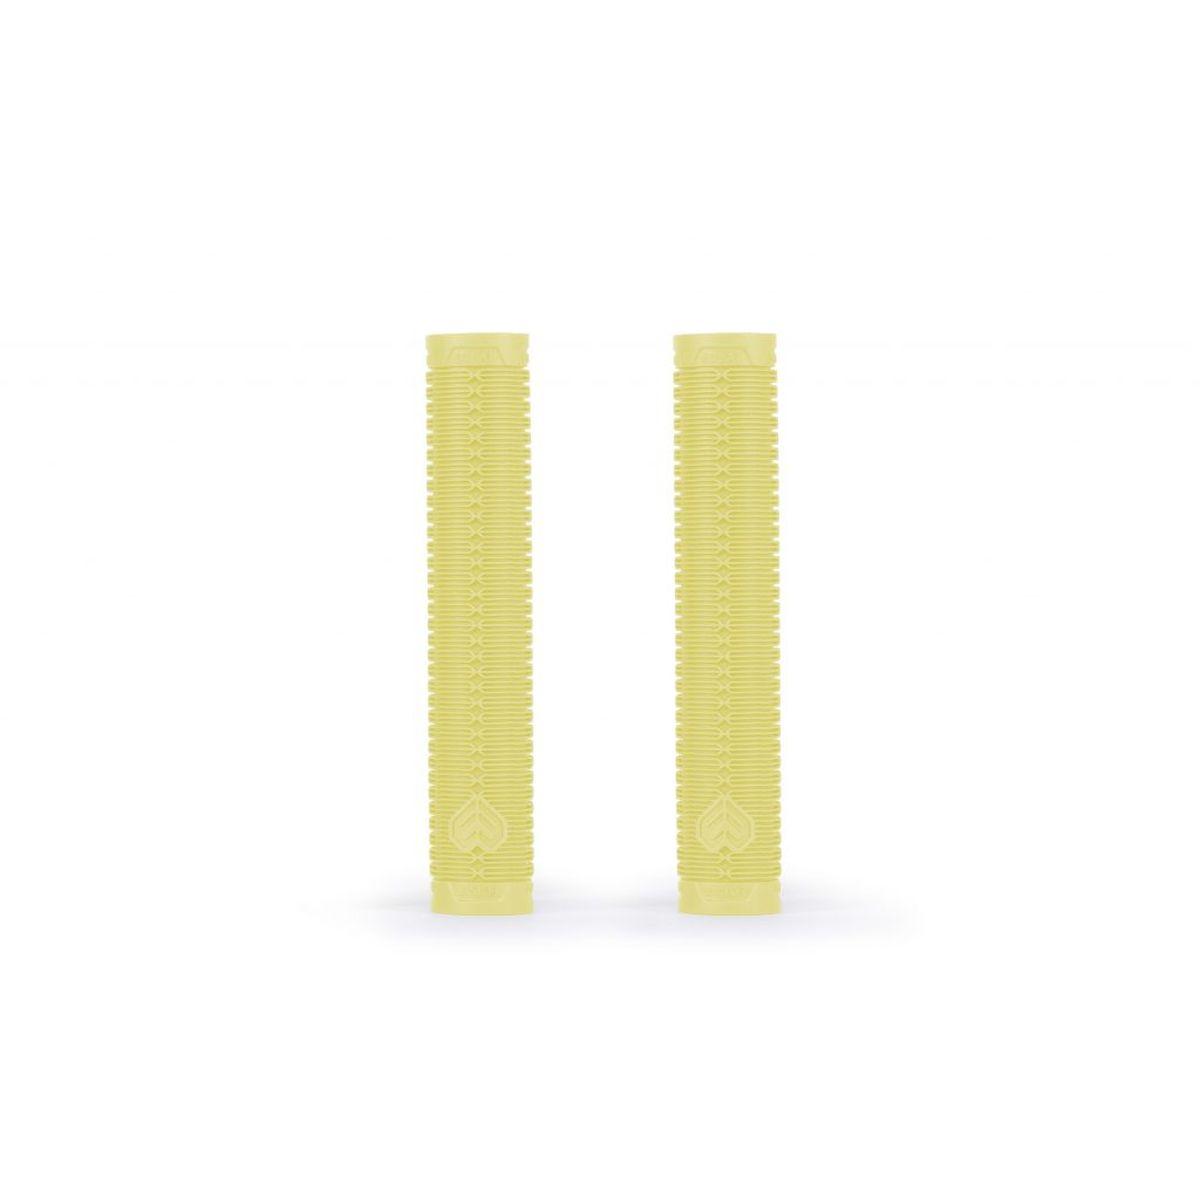 Gripy Eclat Shogun Pastel Yellow